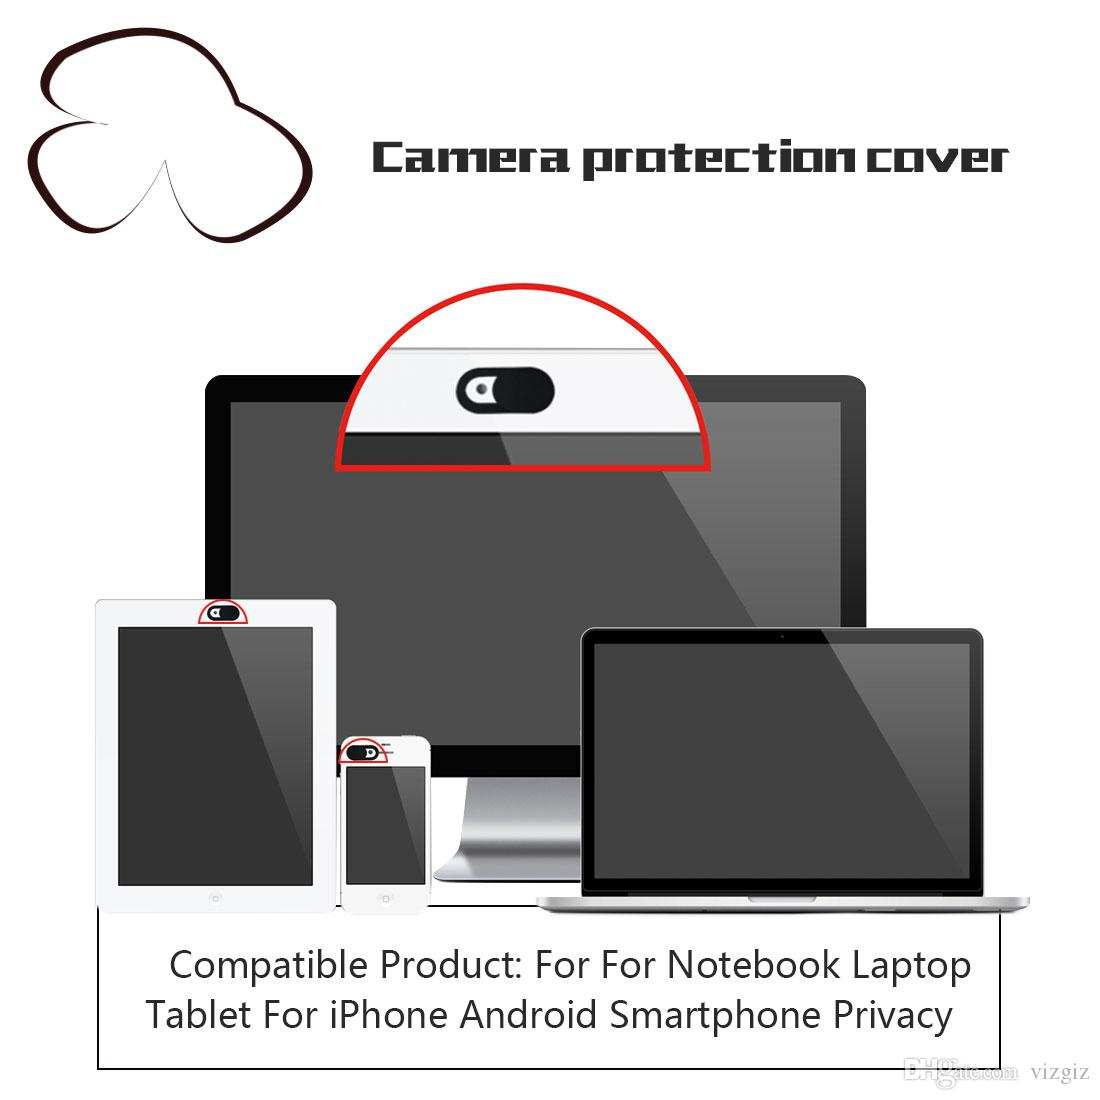 hight resolution of etmakit 2018 high quality webcam cover shutter jpg